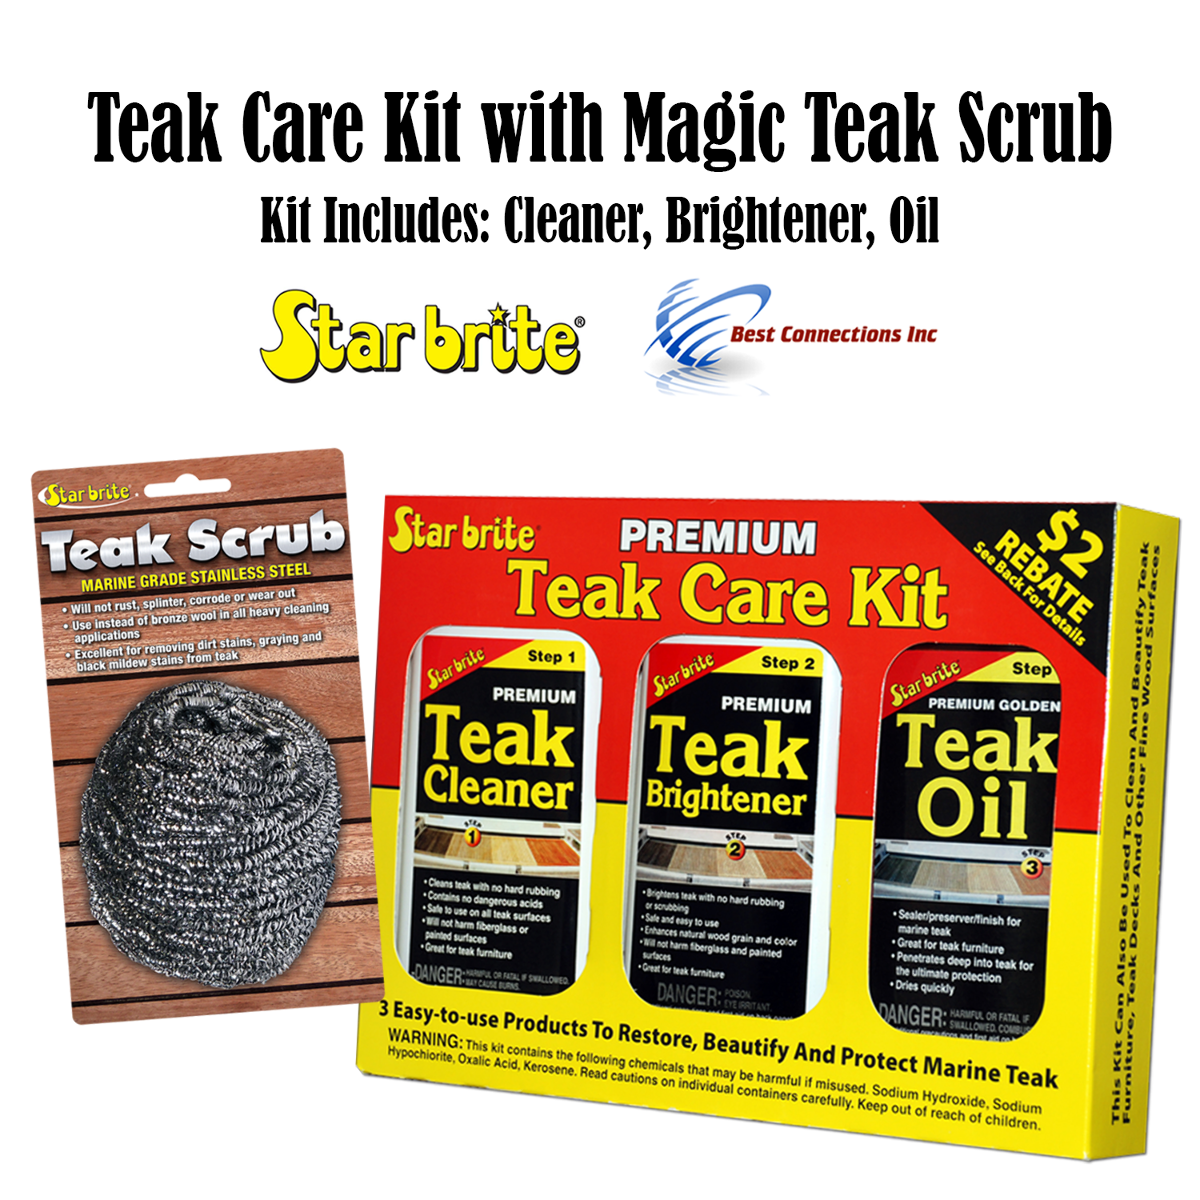 Starbrite Teak Care Kit w/ Magic Teak Scrub BUNDLE Marine Home Heavy Cleaning